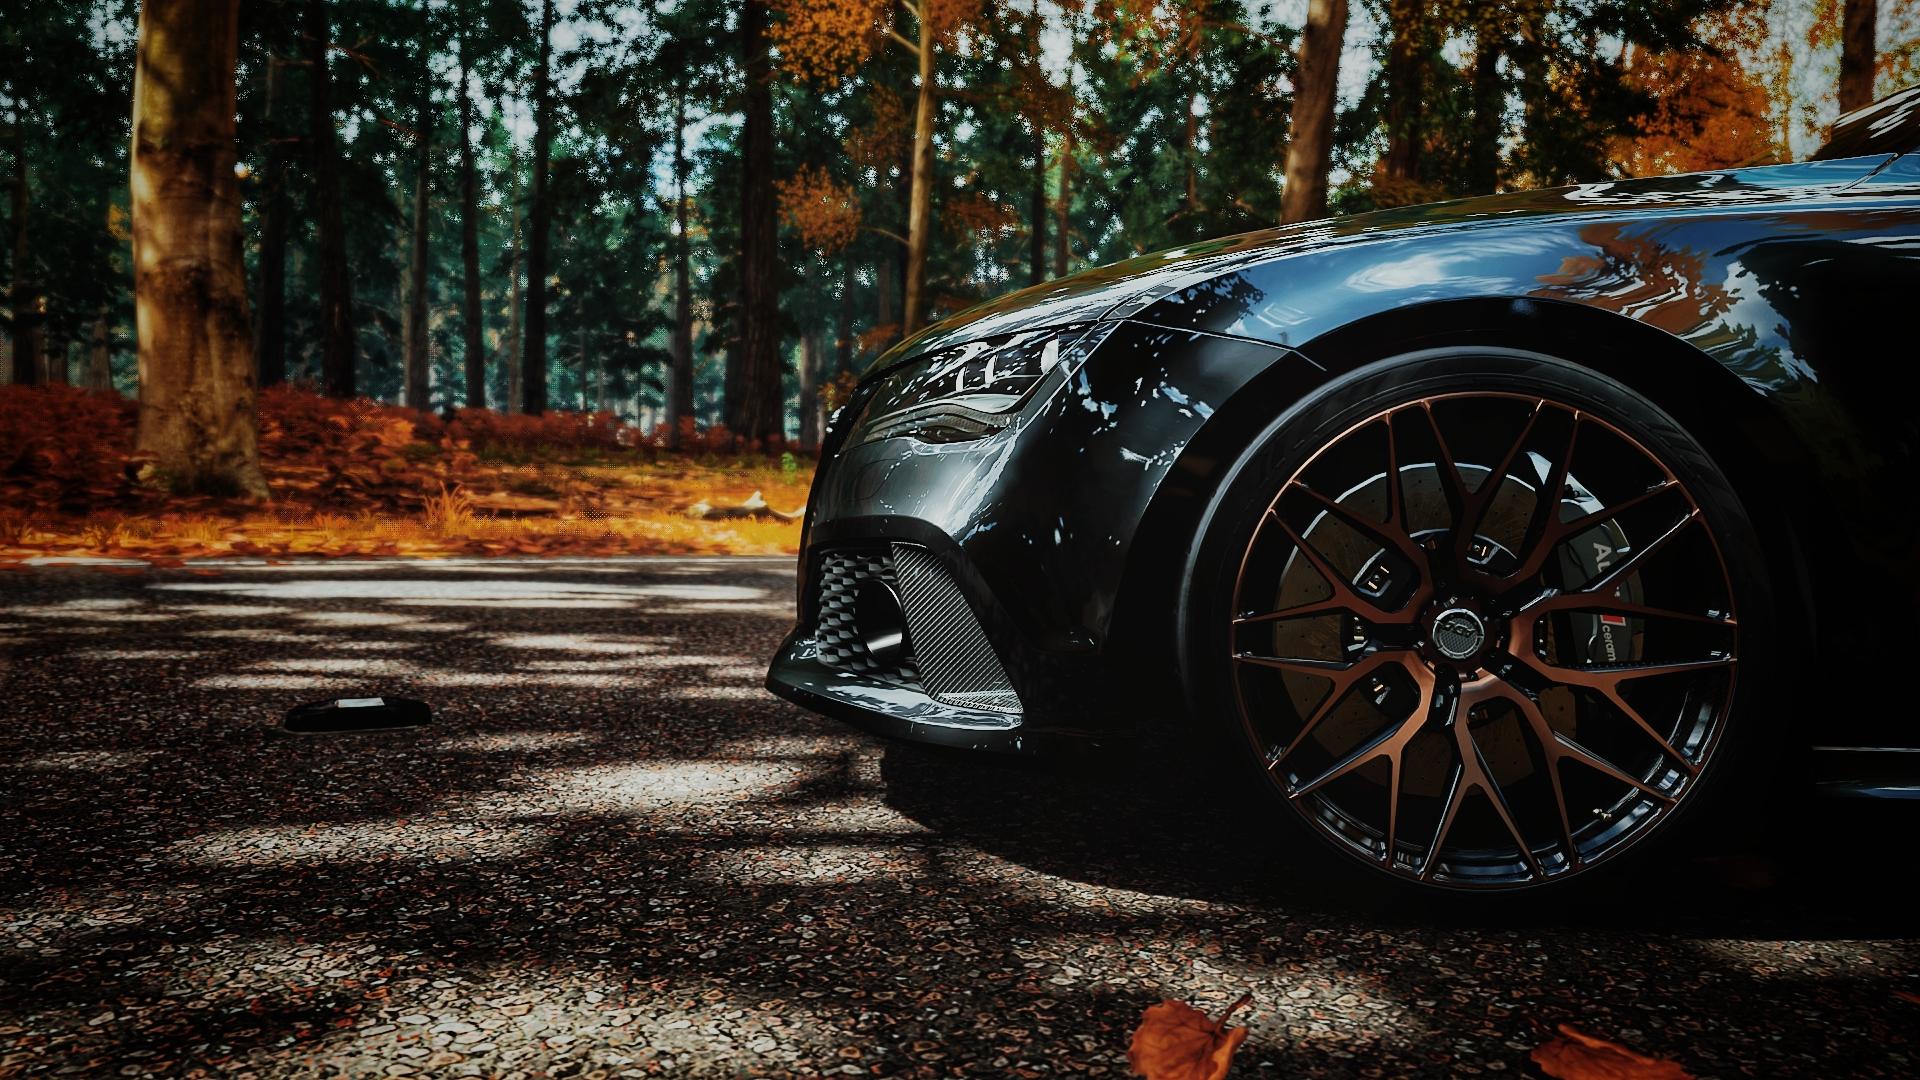 Audi Audi Rs7 Car Forza Horizon 4 Fall Video Games Adv 1 Wallpaper Resolution 1920x1080 Id 498473 Wallha Com